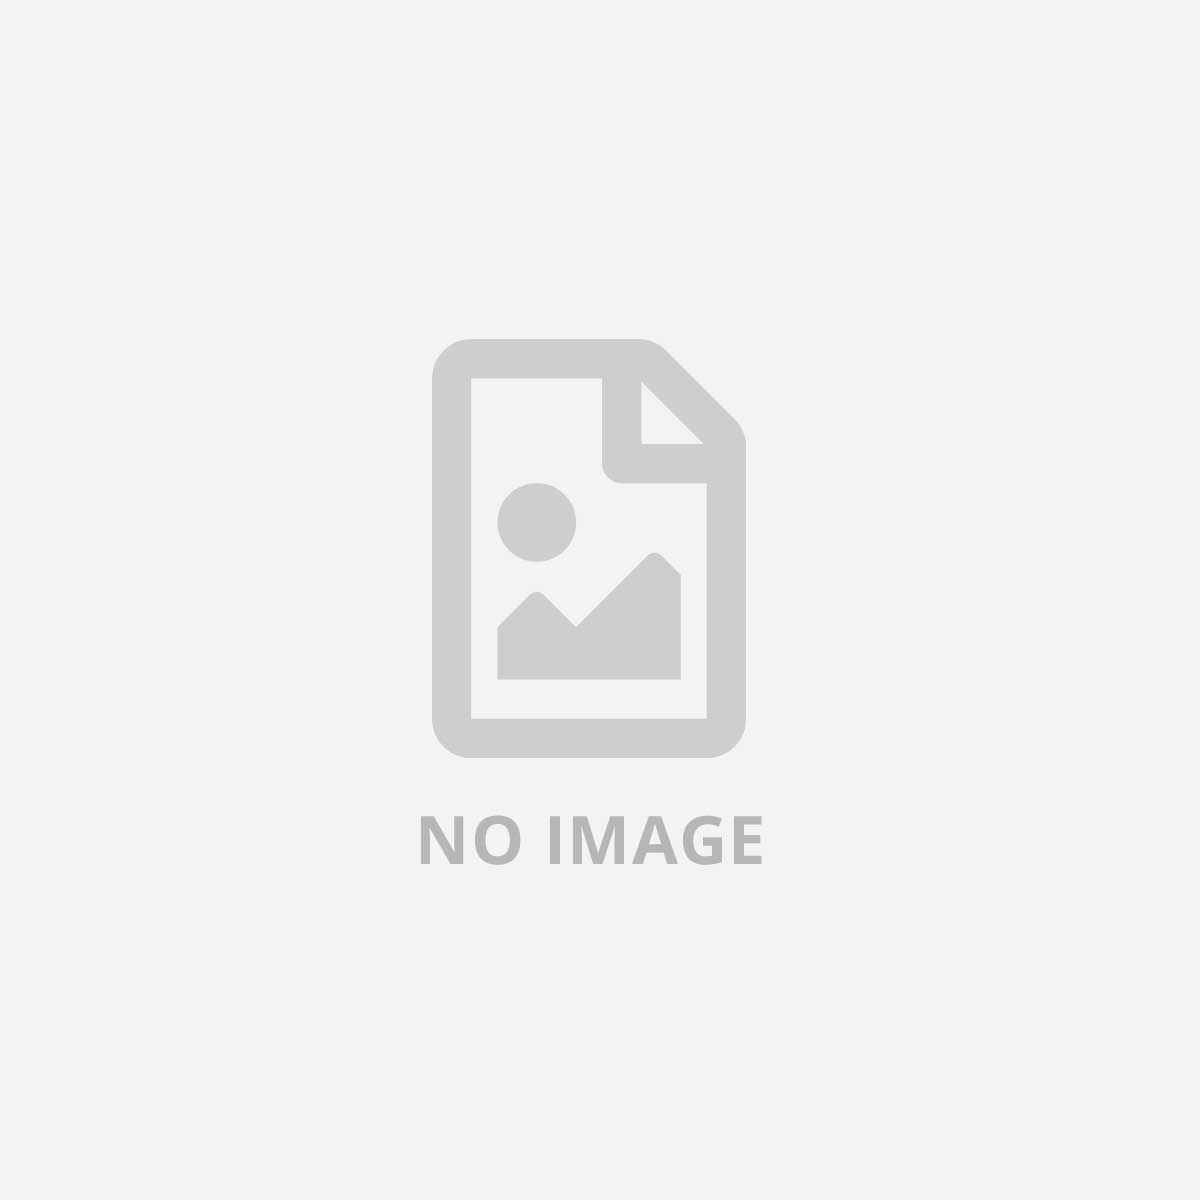 AEROHIVE NETWORKS 2BAND RP-SMA F I/D 5DBI ANTN AP245X